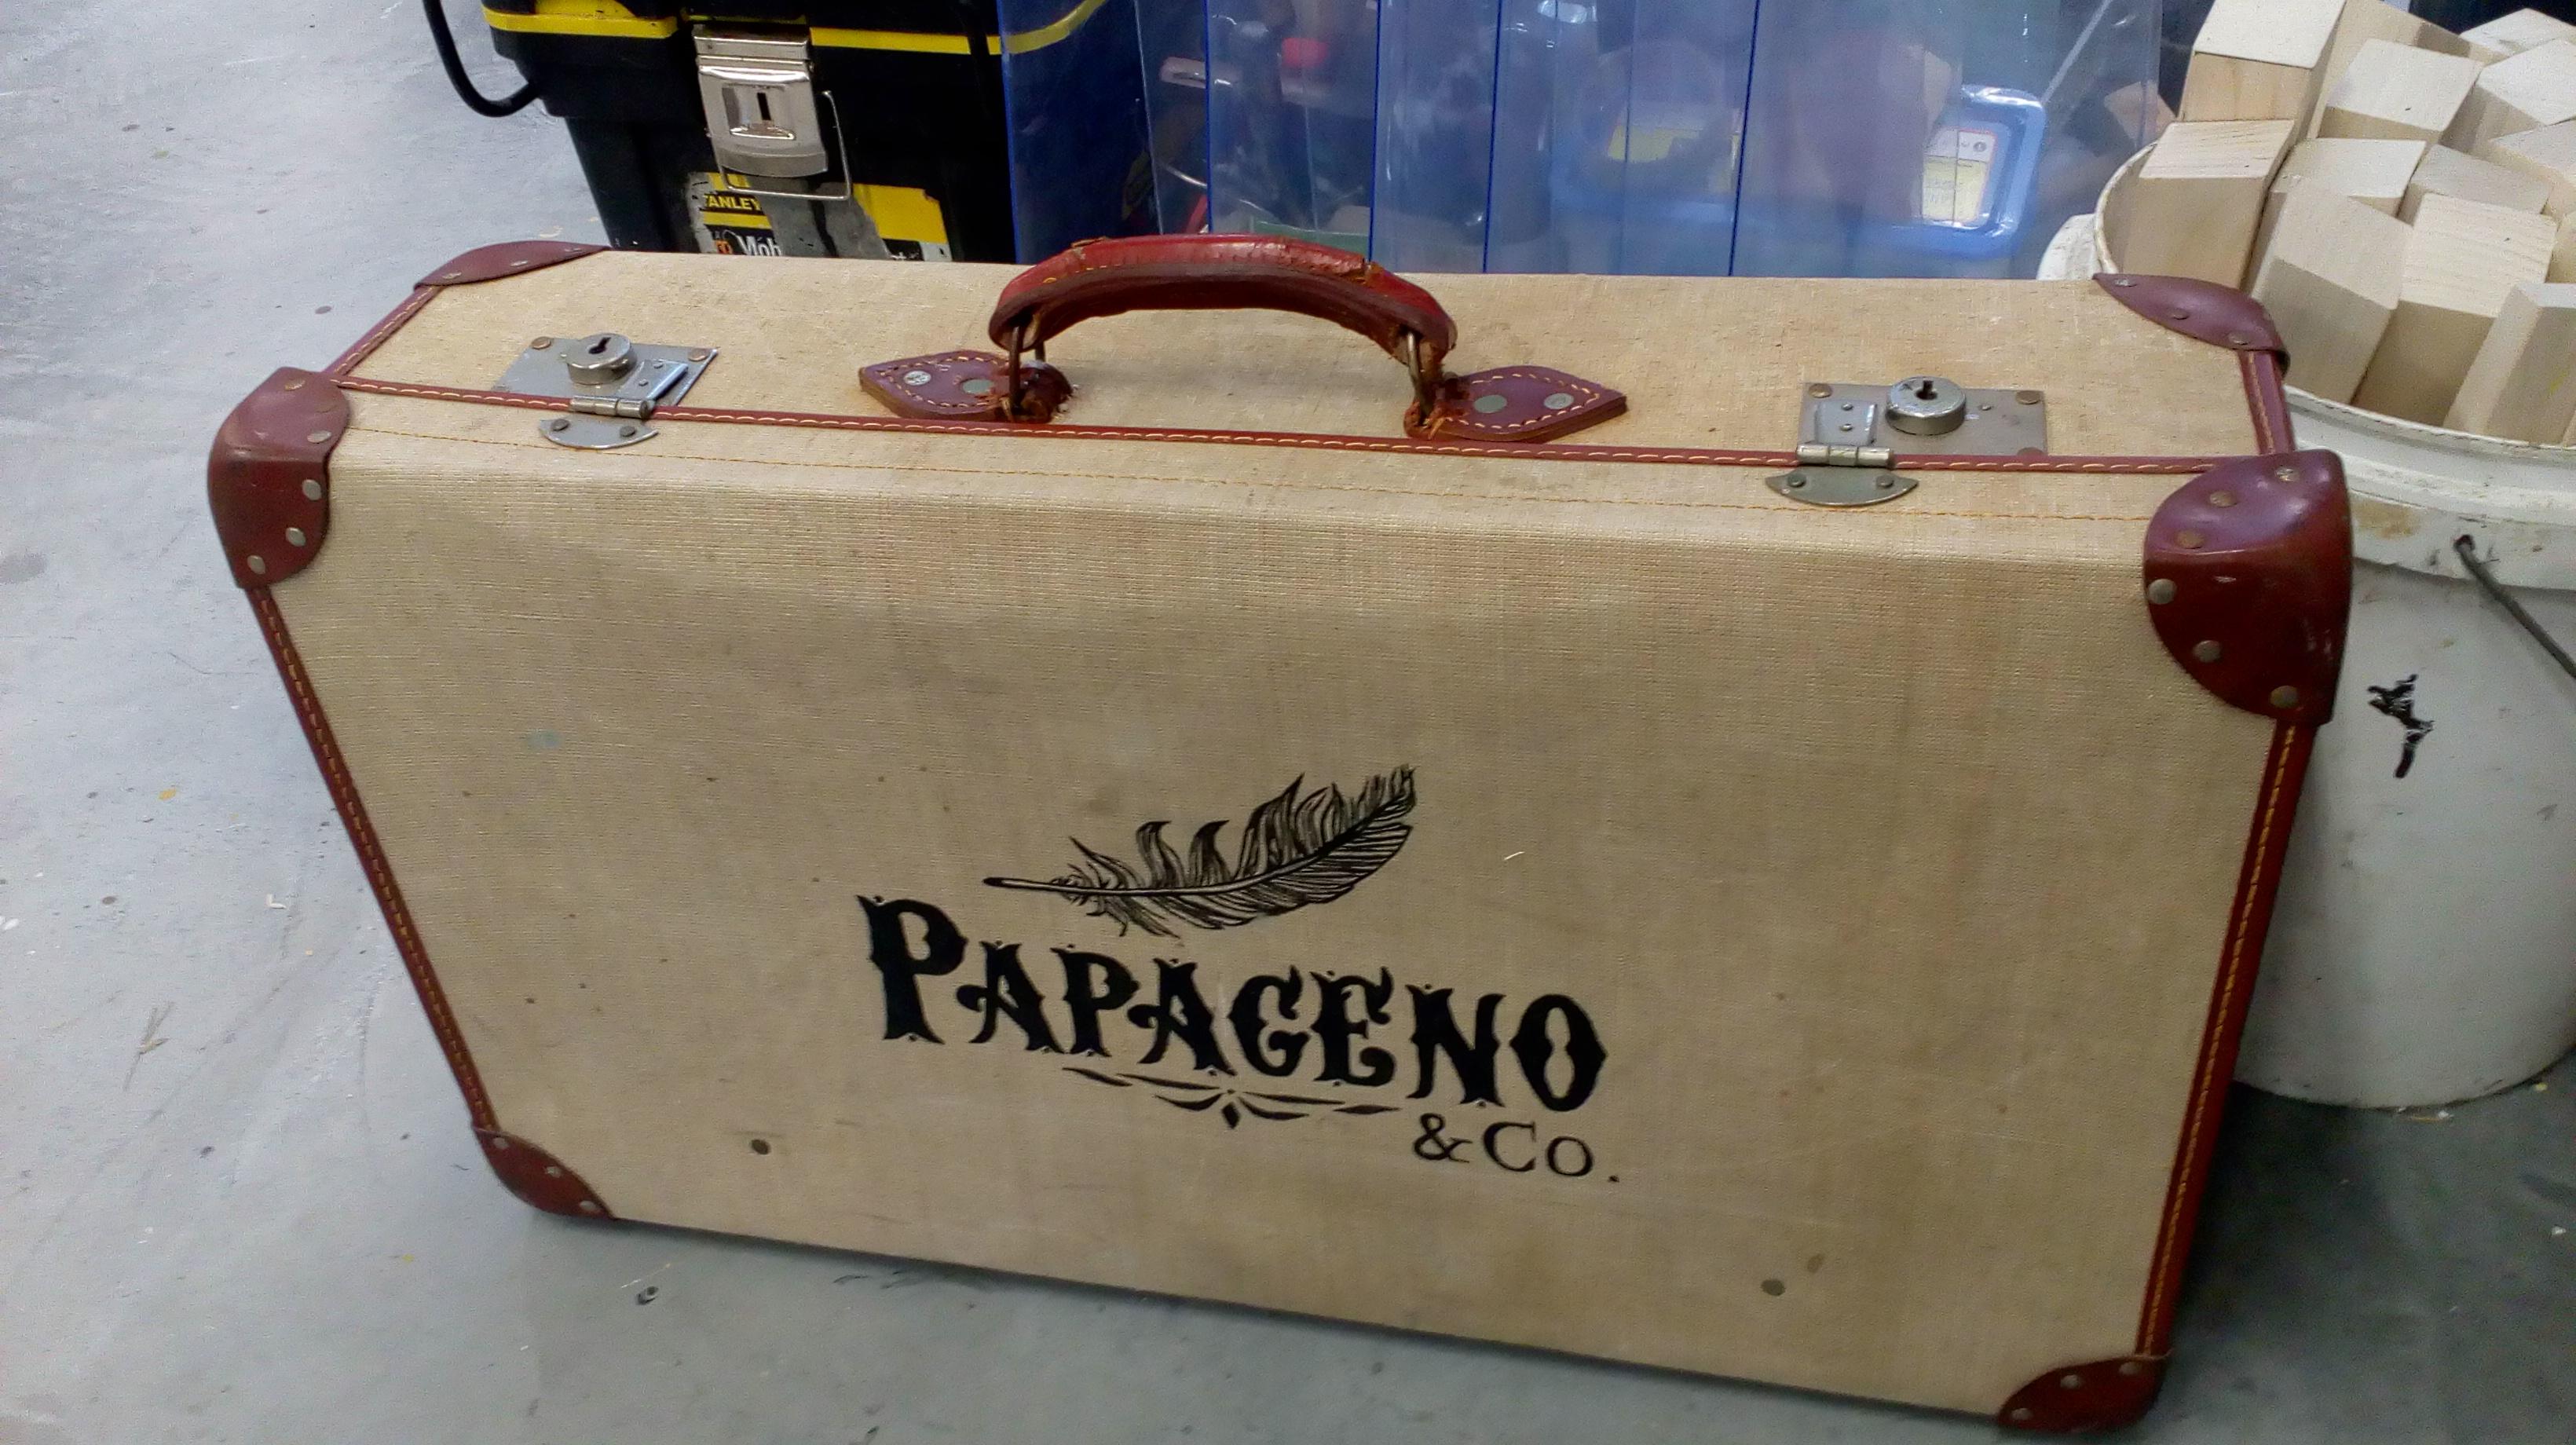 Painted suitcase logo